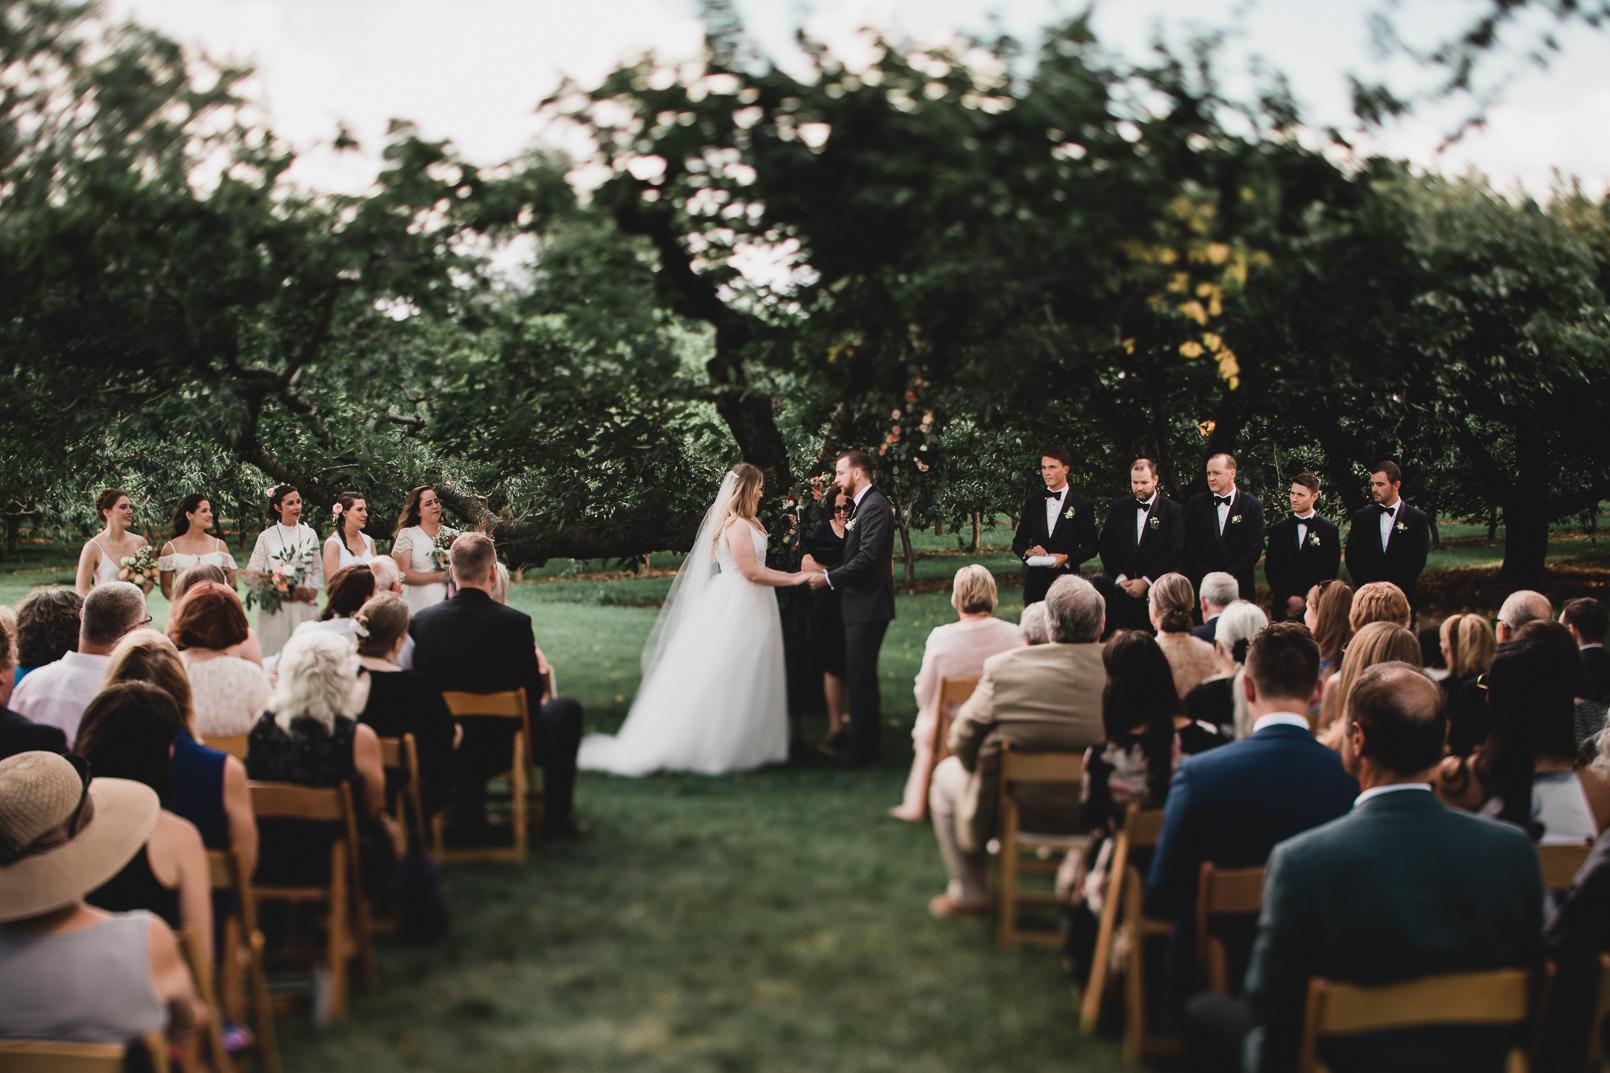 048-Jonathan-Kuhn-Photography-Wedding-_mini.jpg